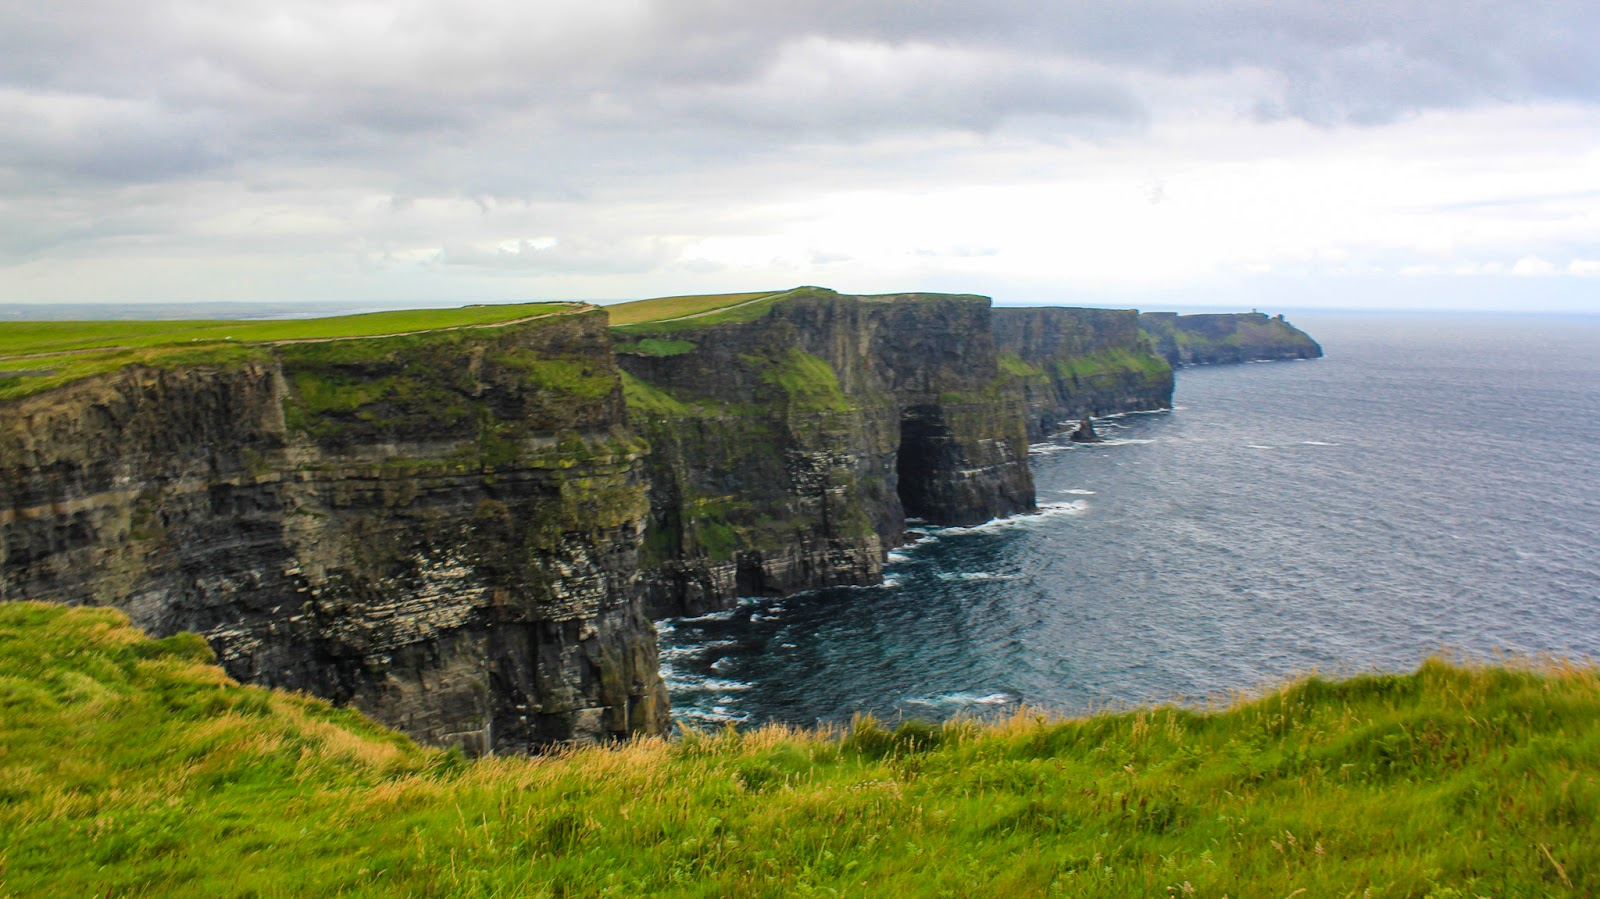 Wild Atlantic Way: A Road Trip Along Ireland's West Coast